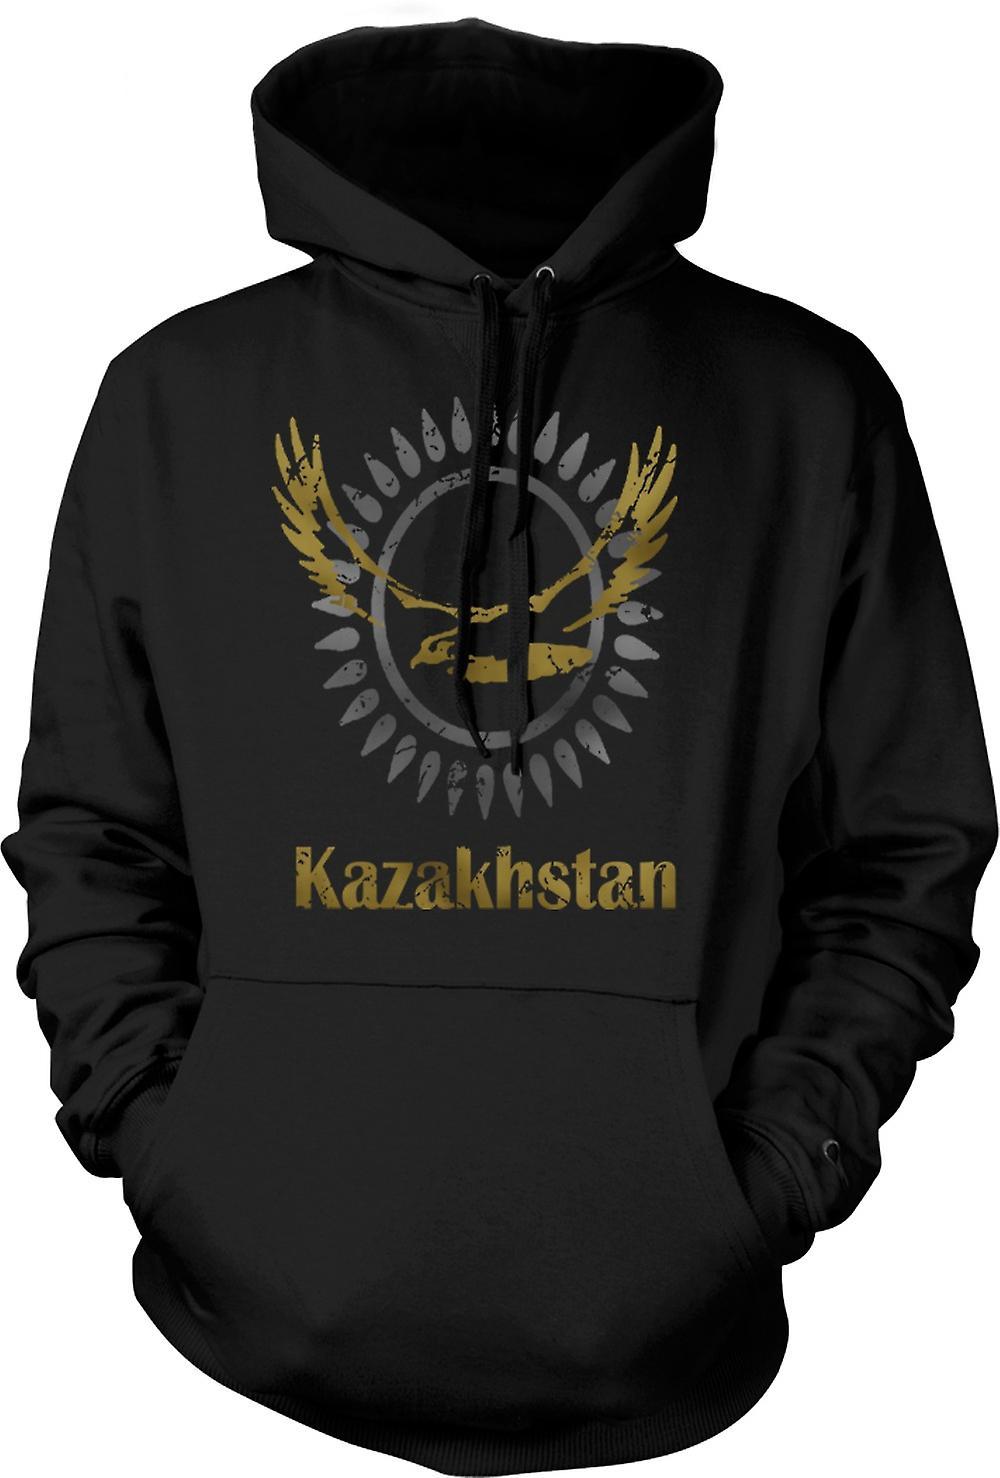 Hoodie - Kazachstan - Cool Kids ontwerpen grappig